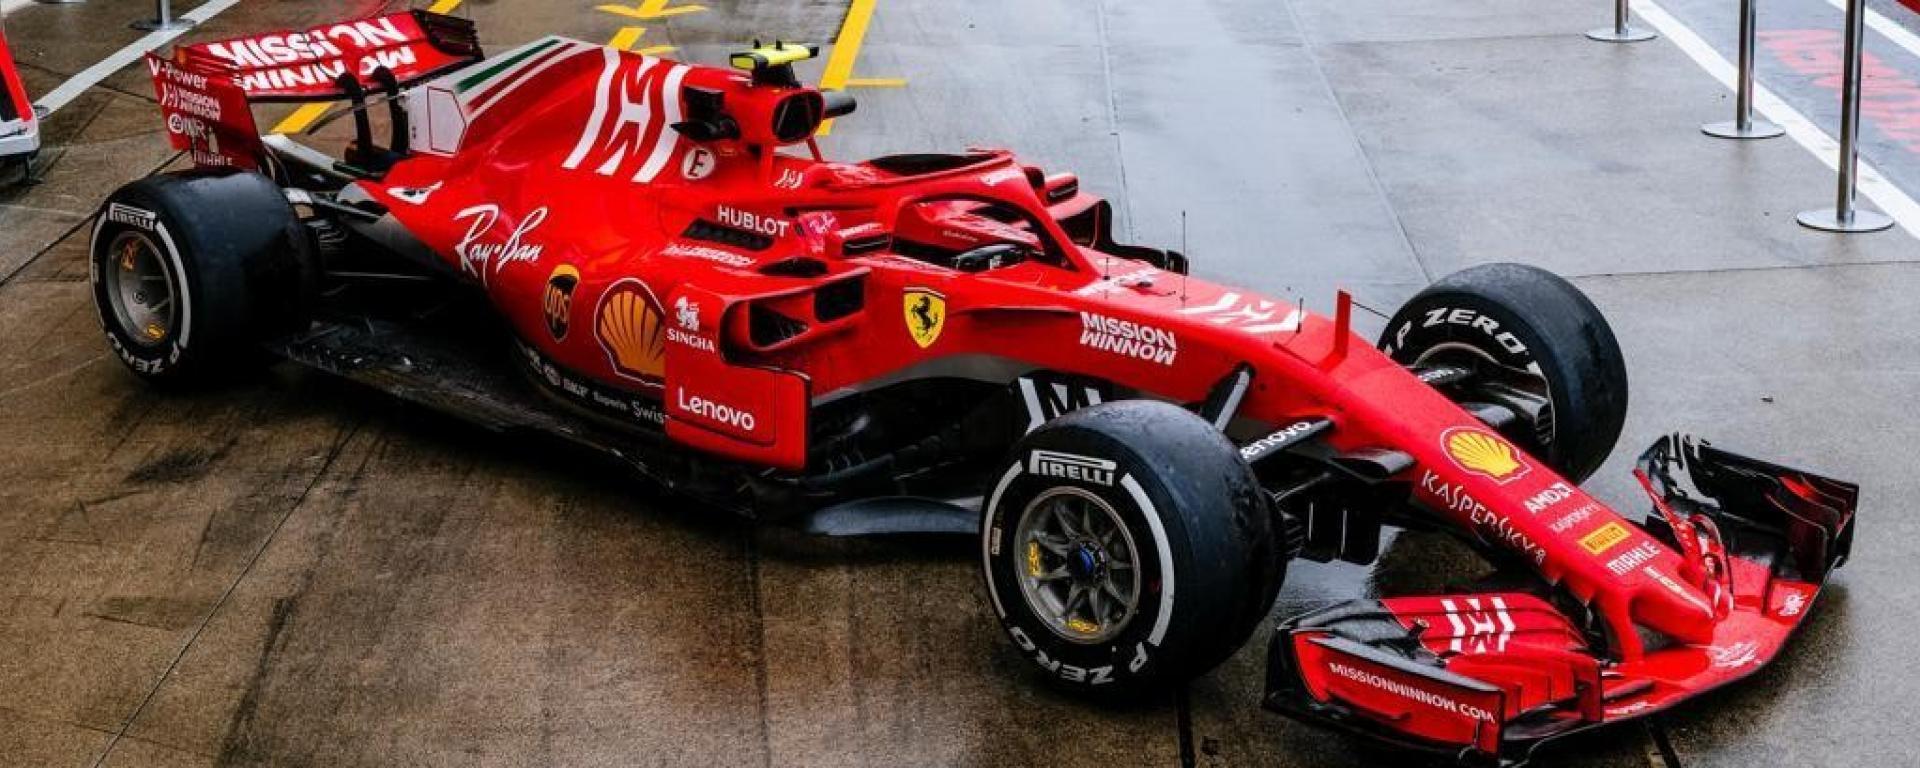 Formula 1 2019 A Look Ahead